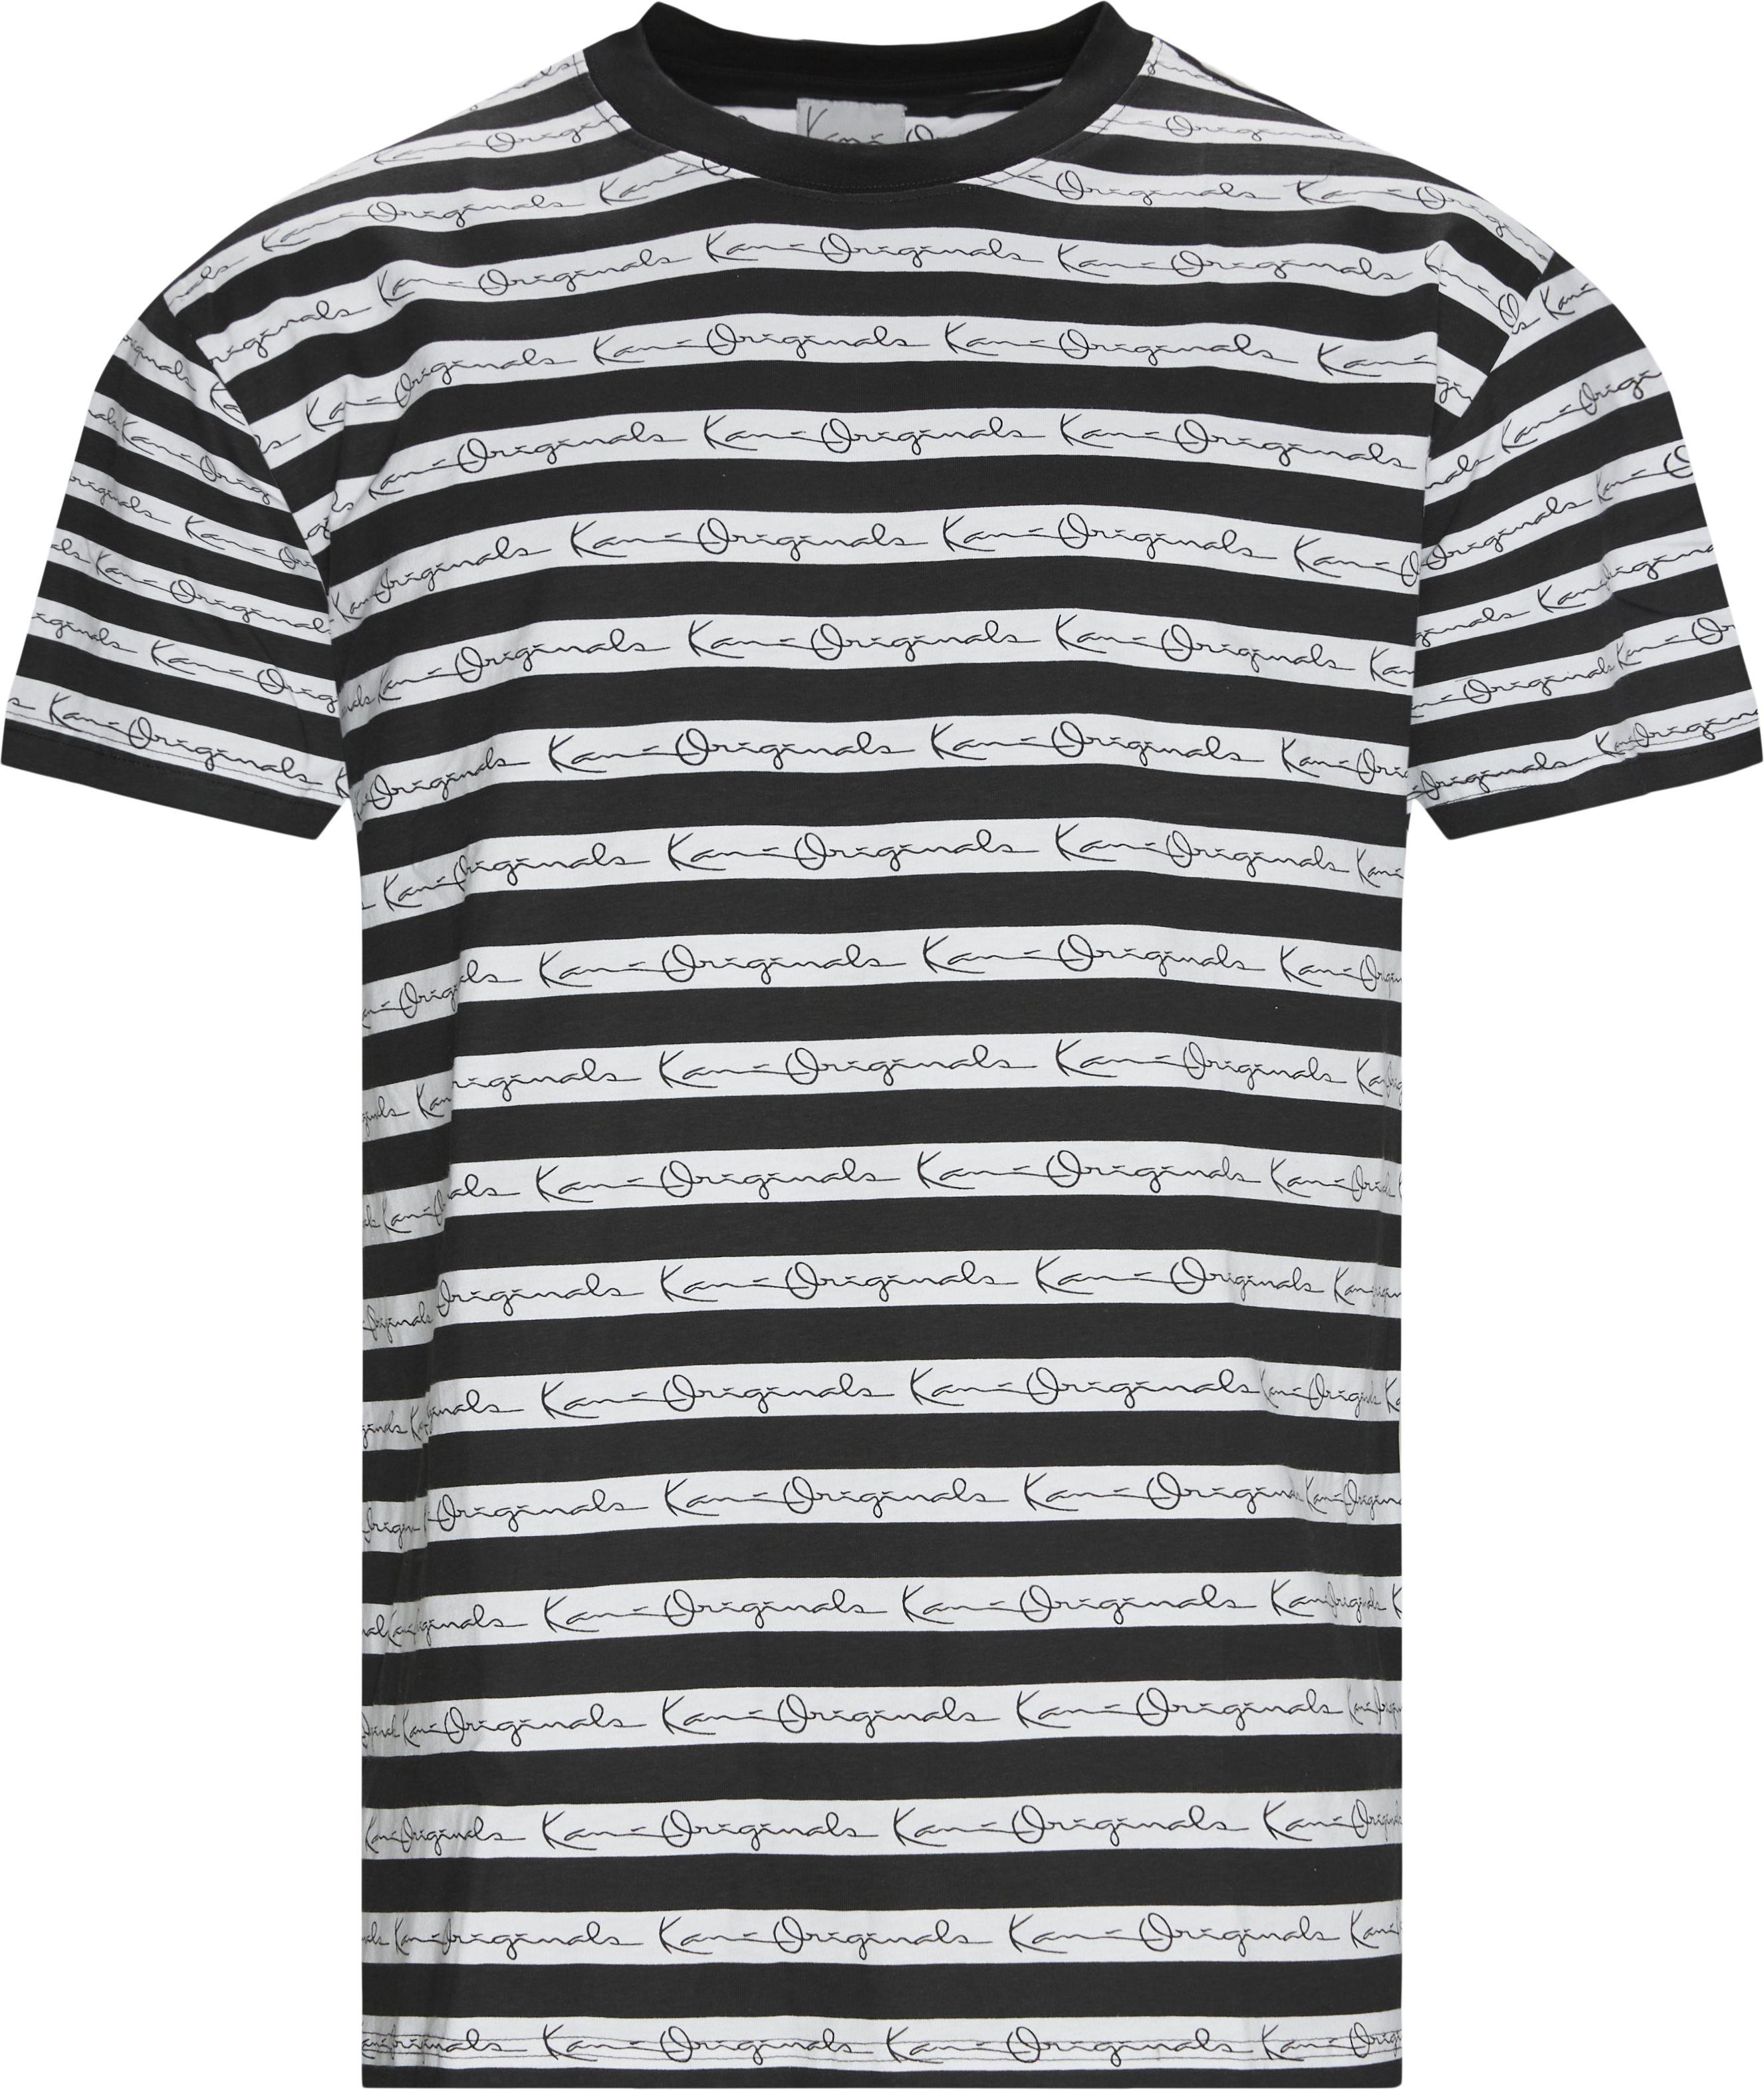 Original Stripe Tee - T-shirts - Regular - Sort